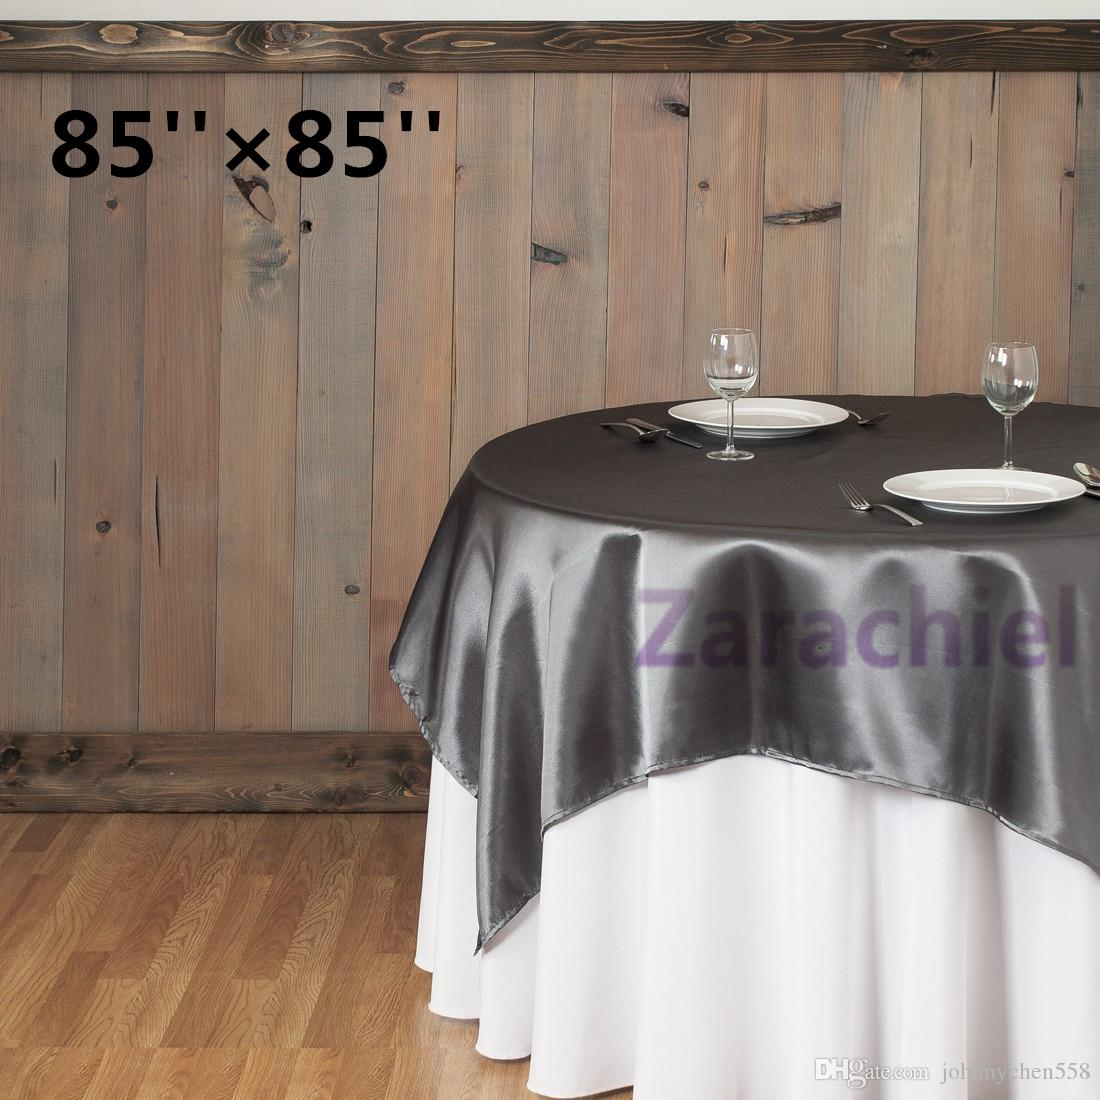 Wholesale Black Tablecloth Overlay 215cmx215cm 85X85 SquareTop Table  Decorations Wedding Party Banquet Supply Multi Colors Table Overlay Table  Overlay For ...